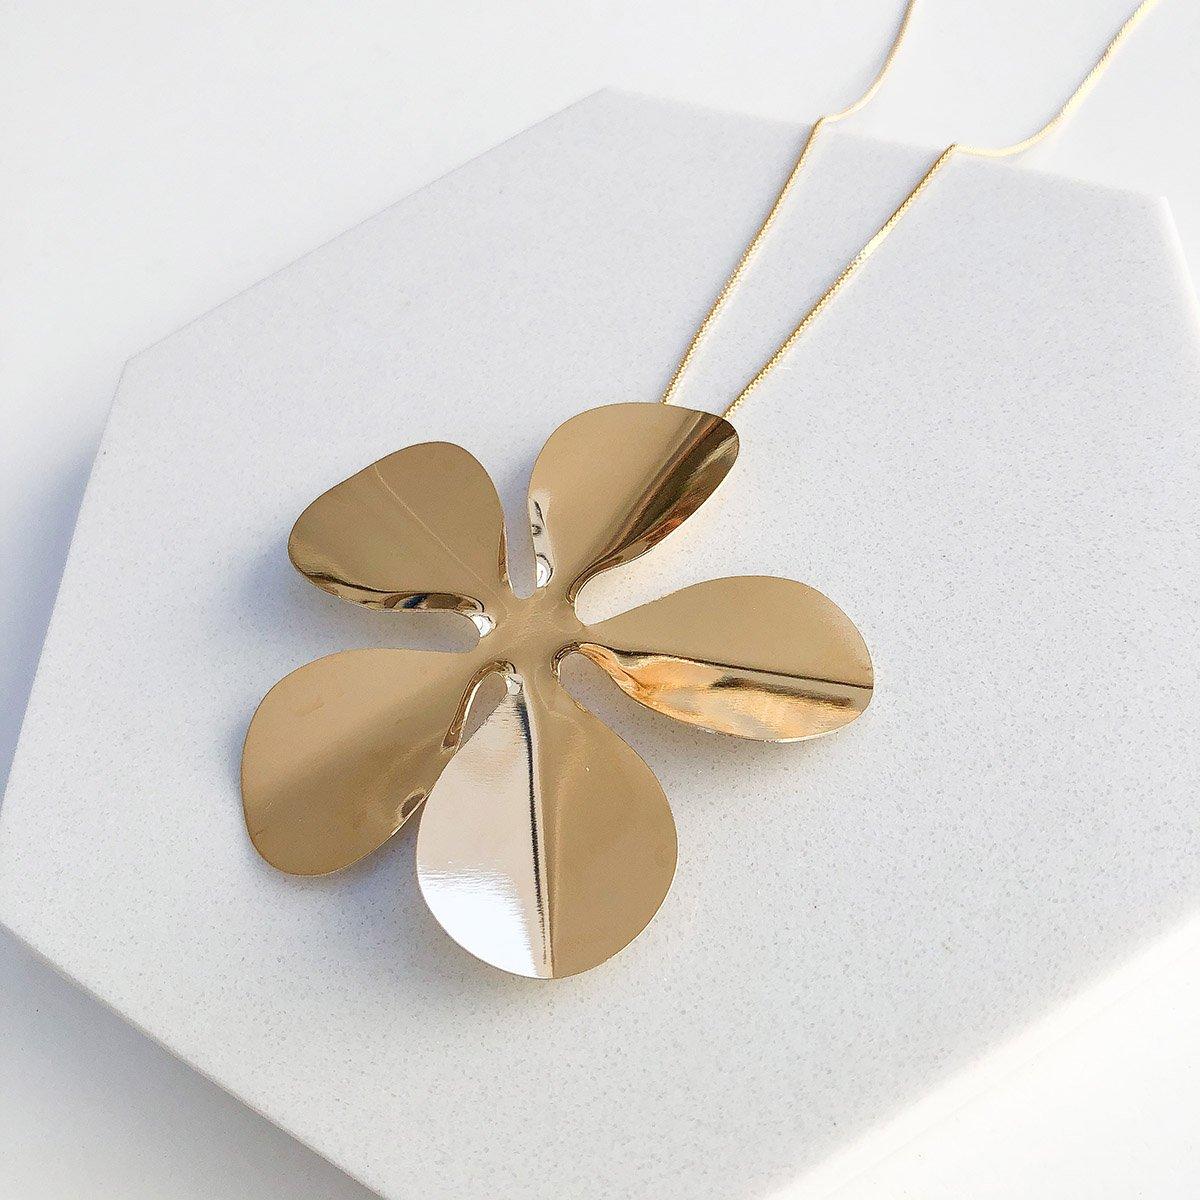 Colar Banhado a Ouro 18k Longo Flor